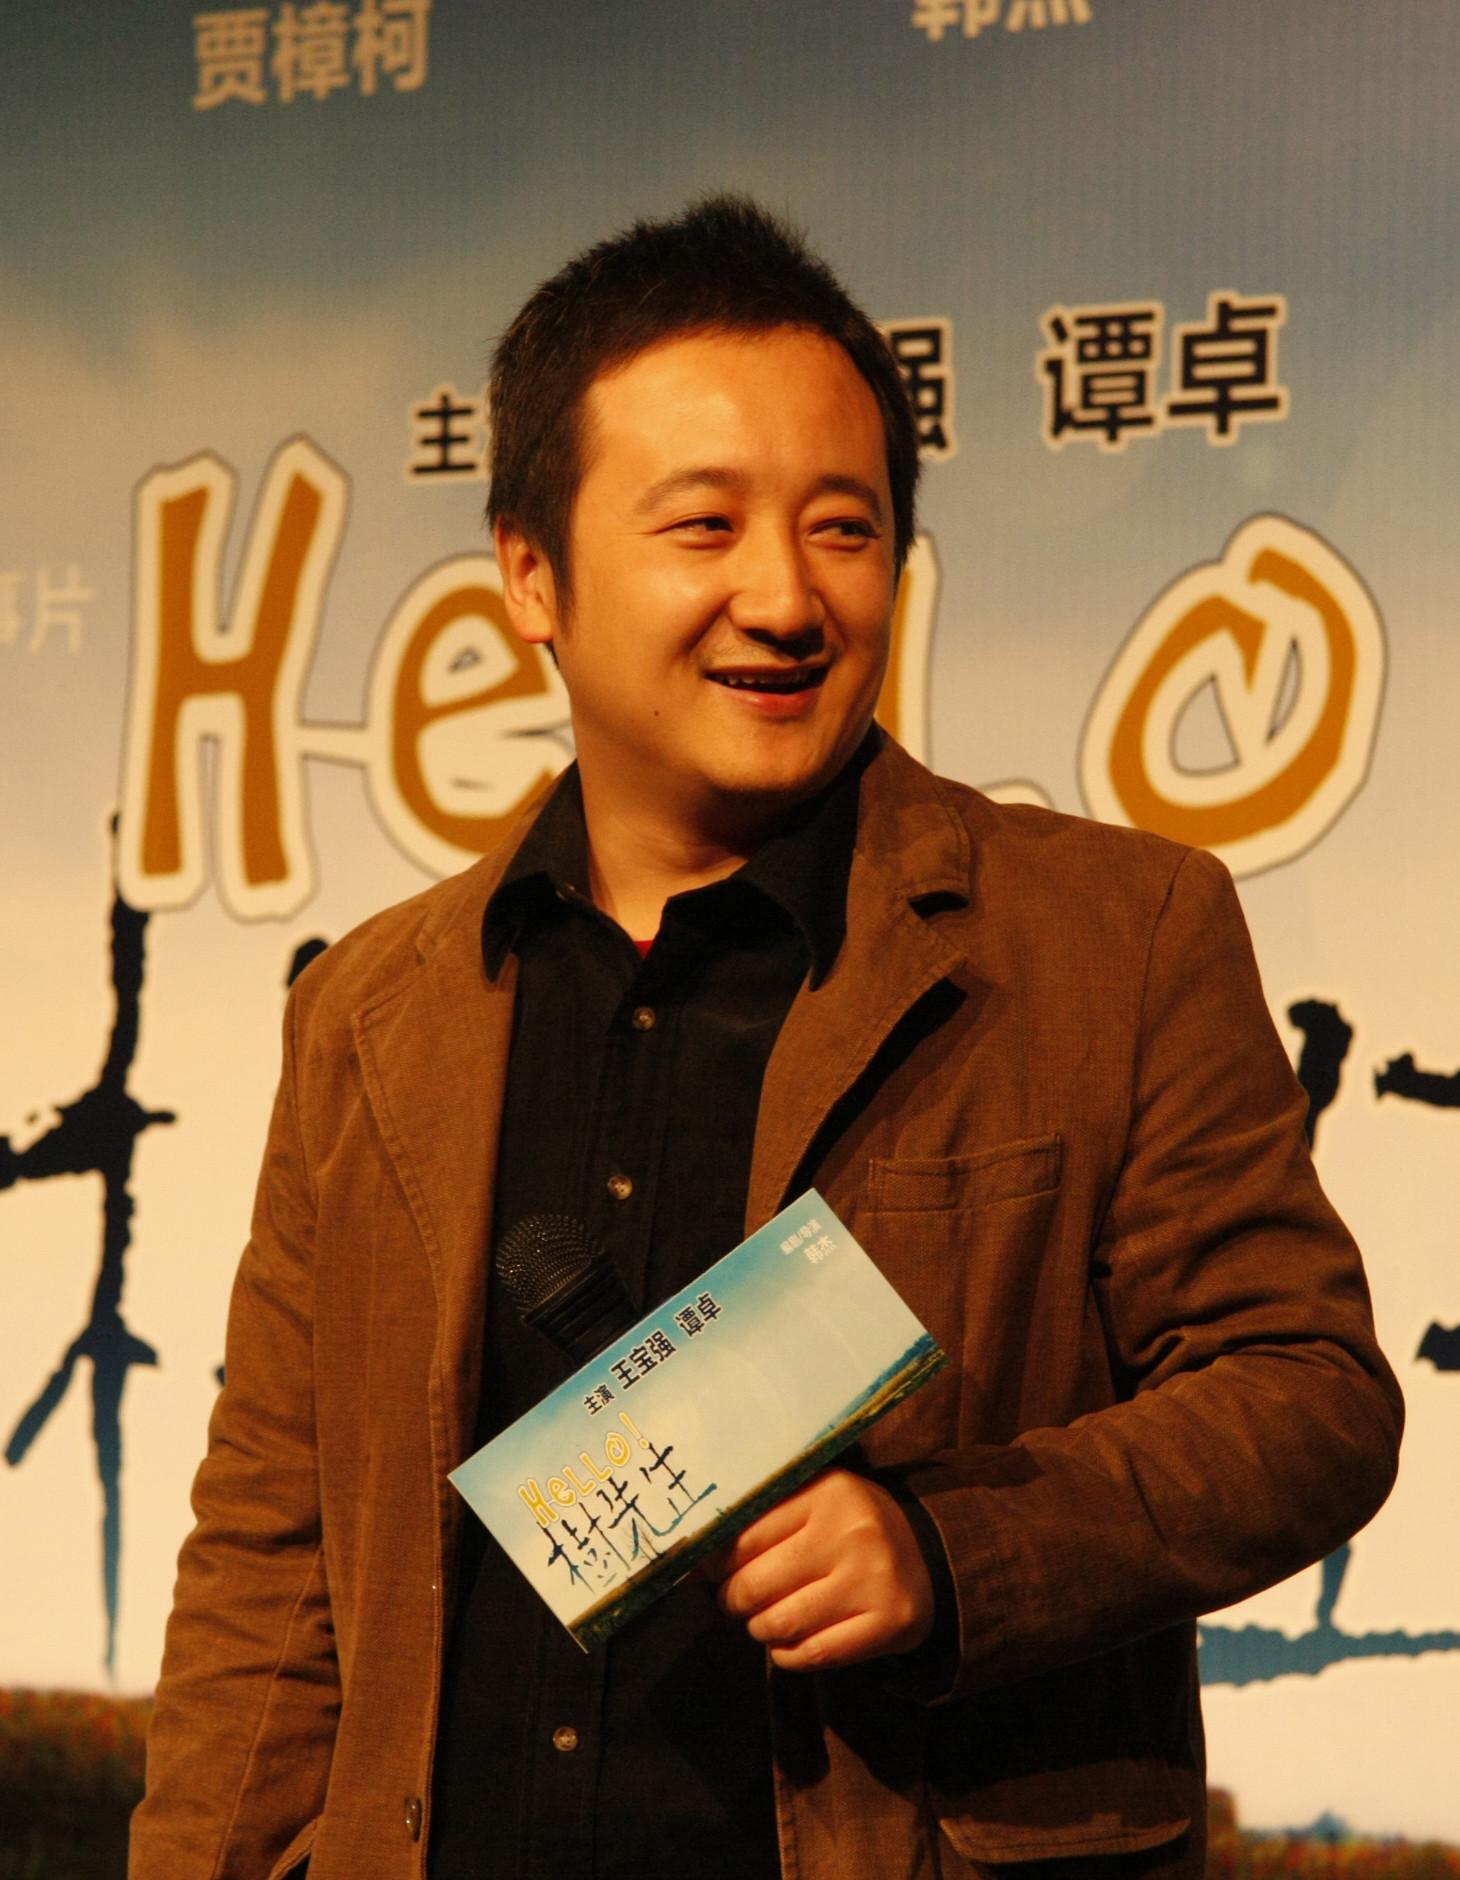 Director Han Jie